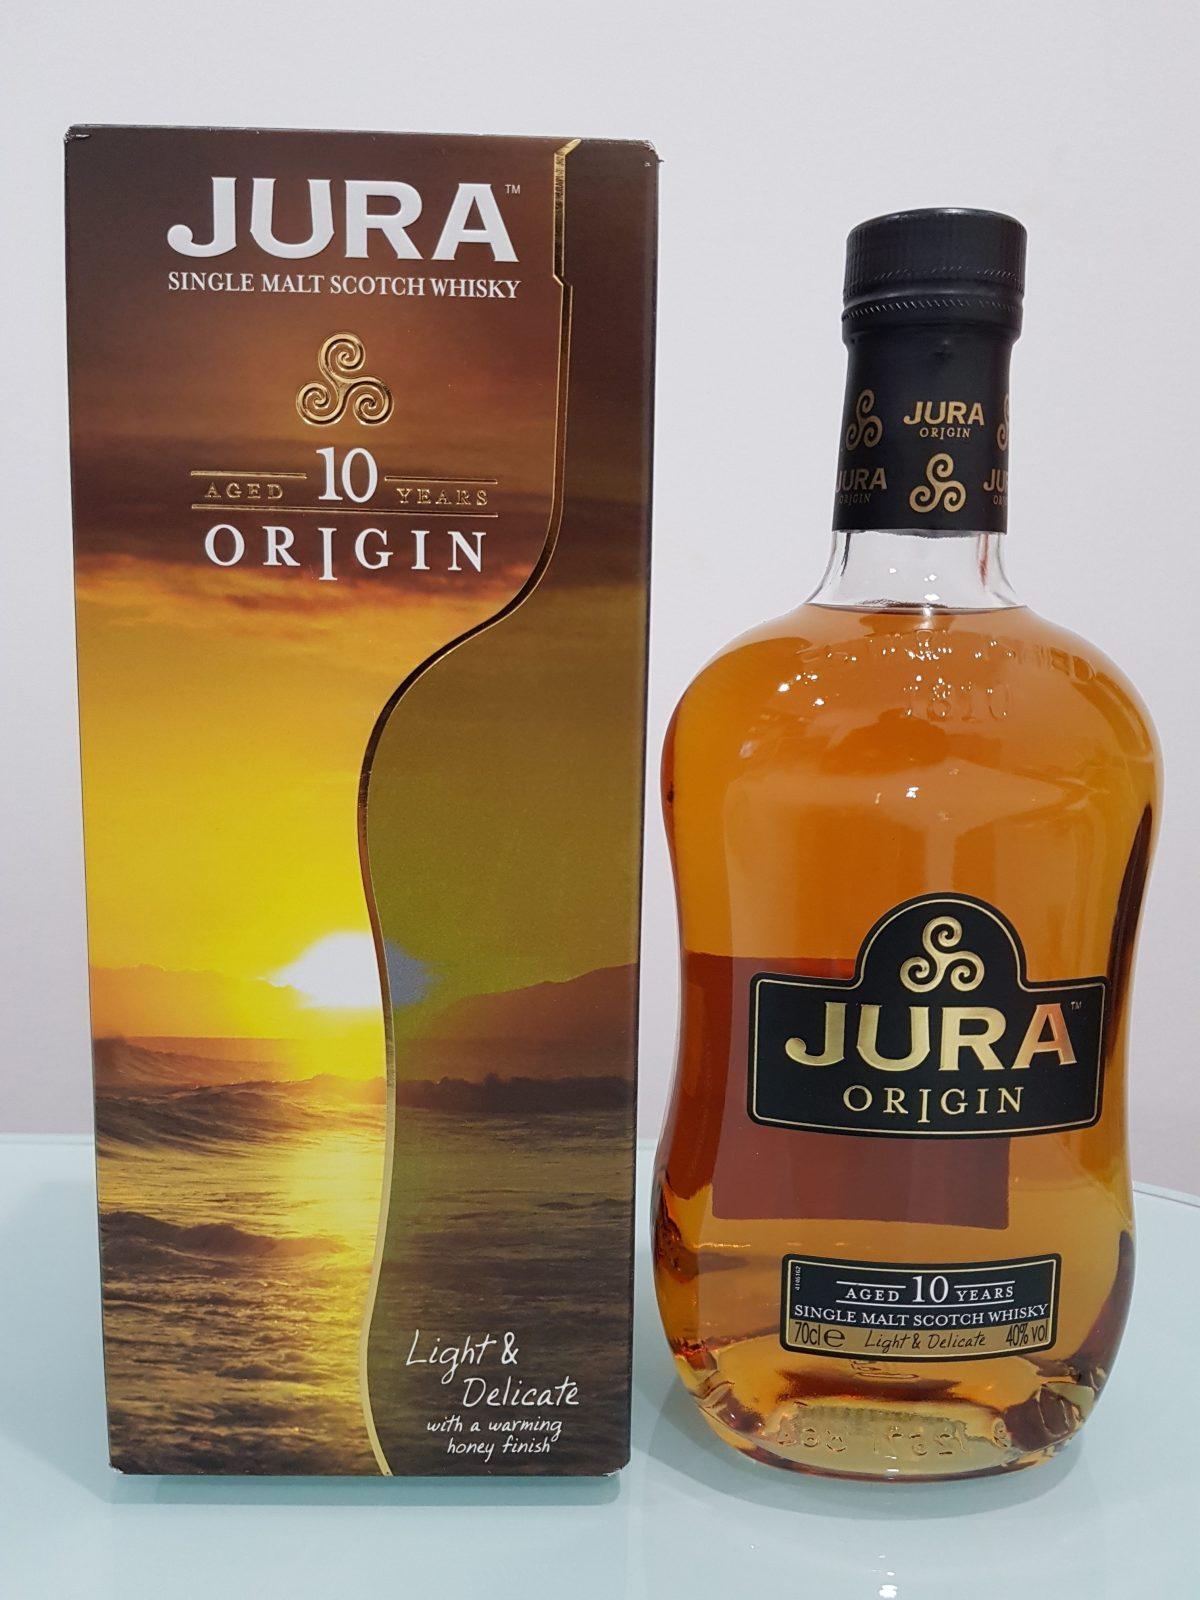 Isle of Jura Origin 10 Year Old Single Malt Scotch Whisky 700ml 40 % abv